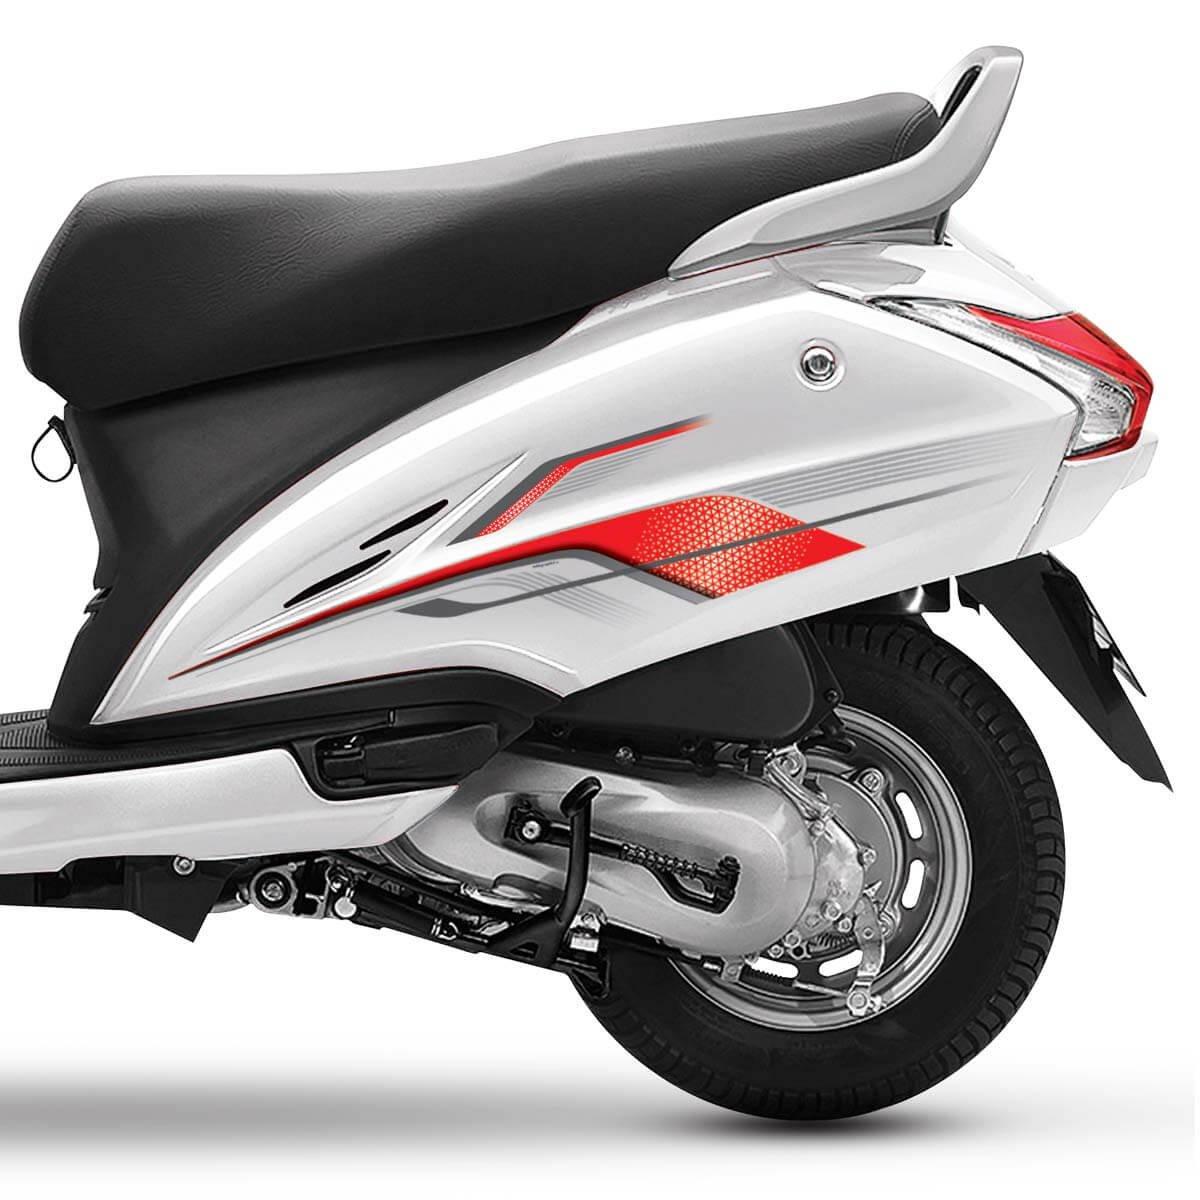 Autographix Dio Bike Snickering For Scooty Activa Stickers Design Honda Graphics 4g 3g Red Magic Car Motorbike